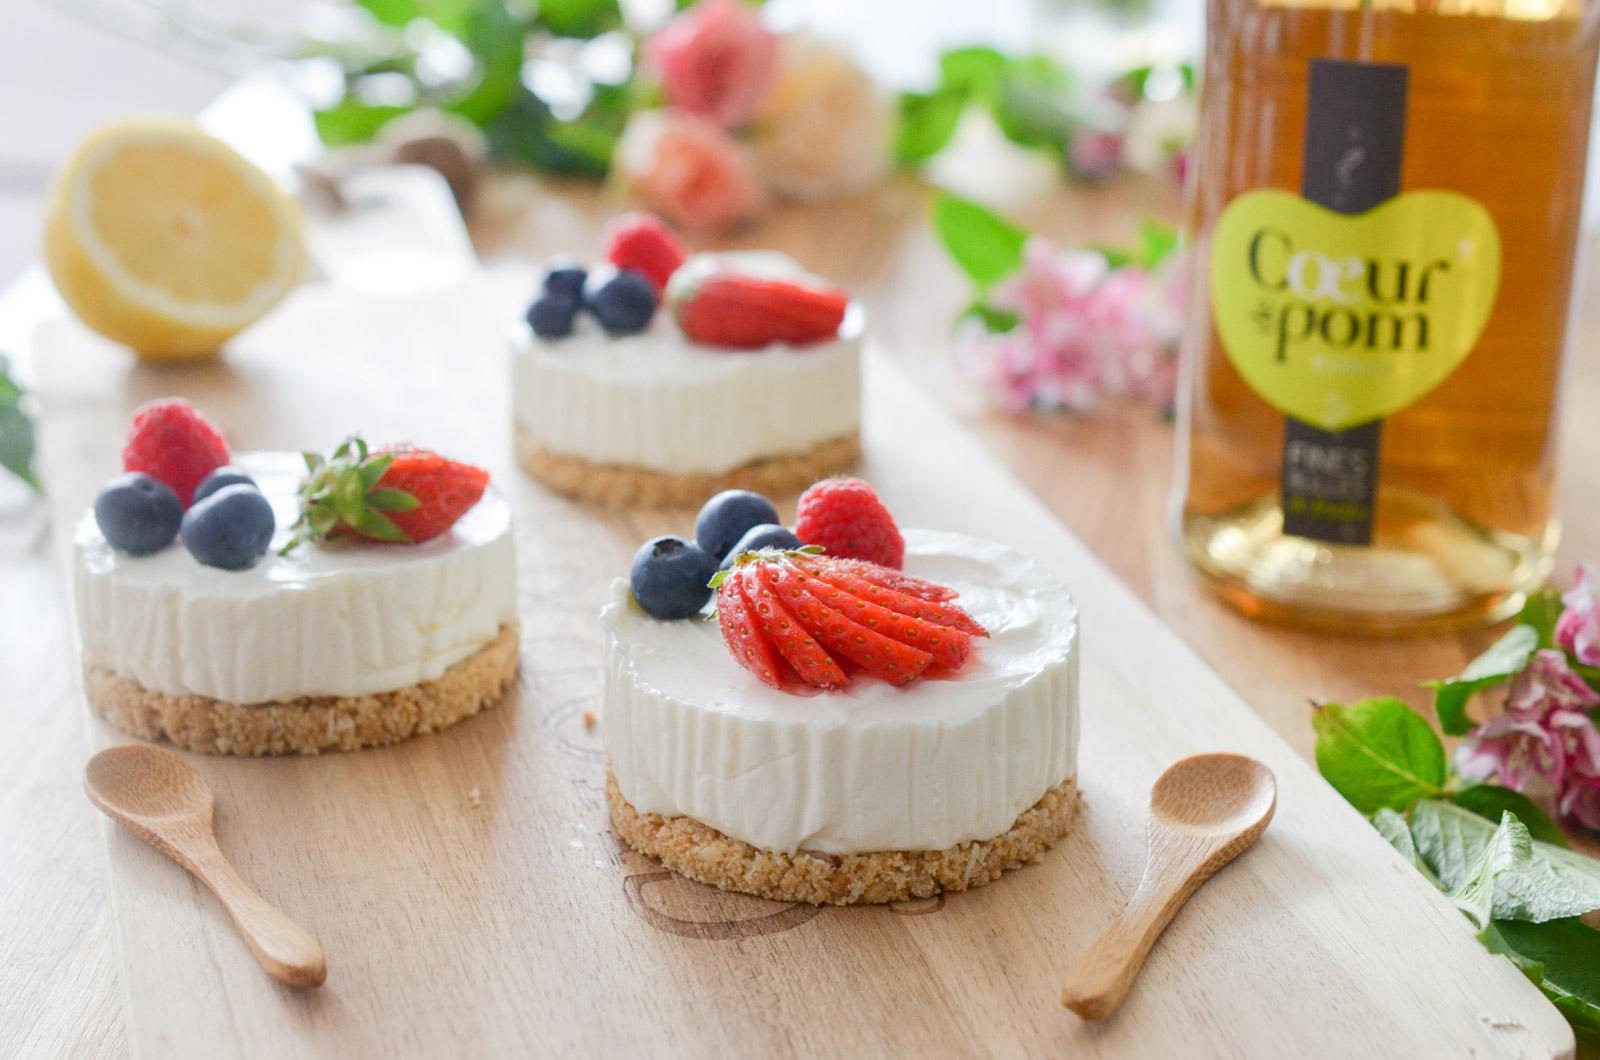 Cheesecake sans cuisson aux fruits rouges